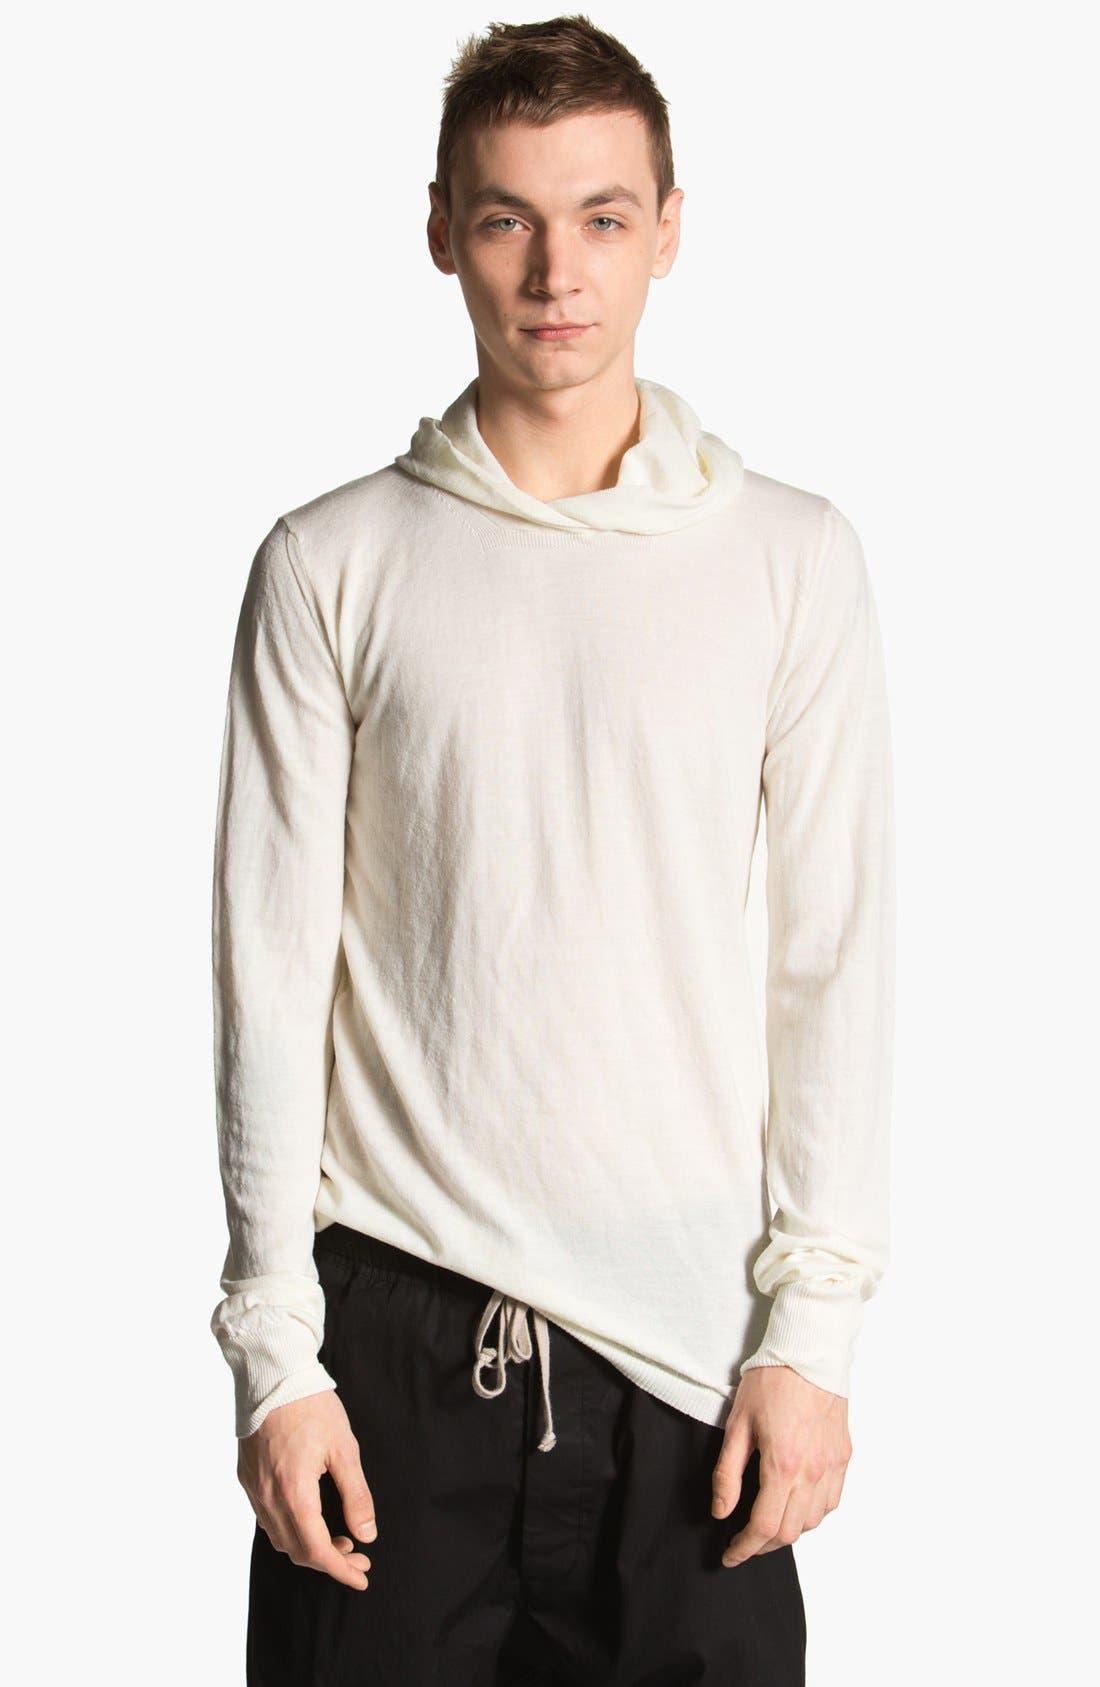 Alternate Image 1 Selected - Rick Owens 'Island' Hooded Merino Wool Sweater